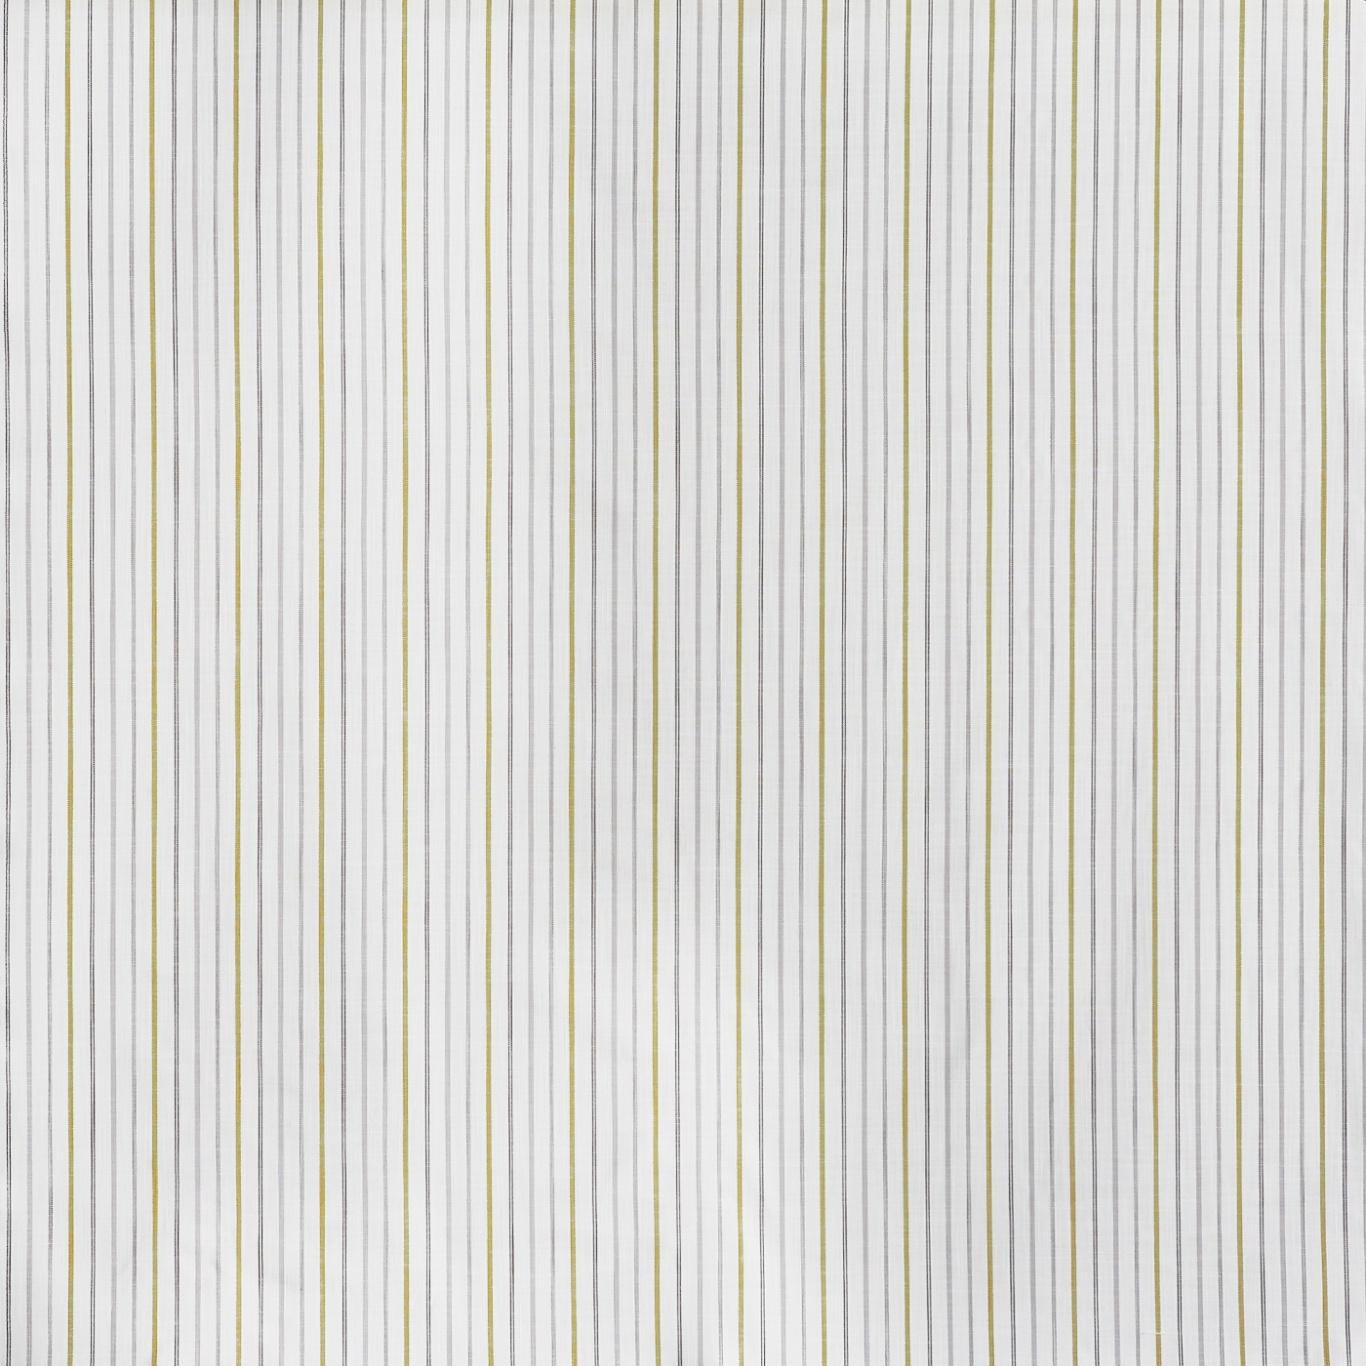 Image of Prestigious Woodmere Mimosa Fabric 3819/811